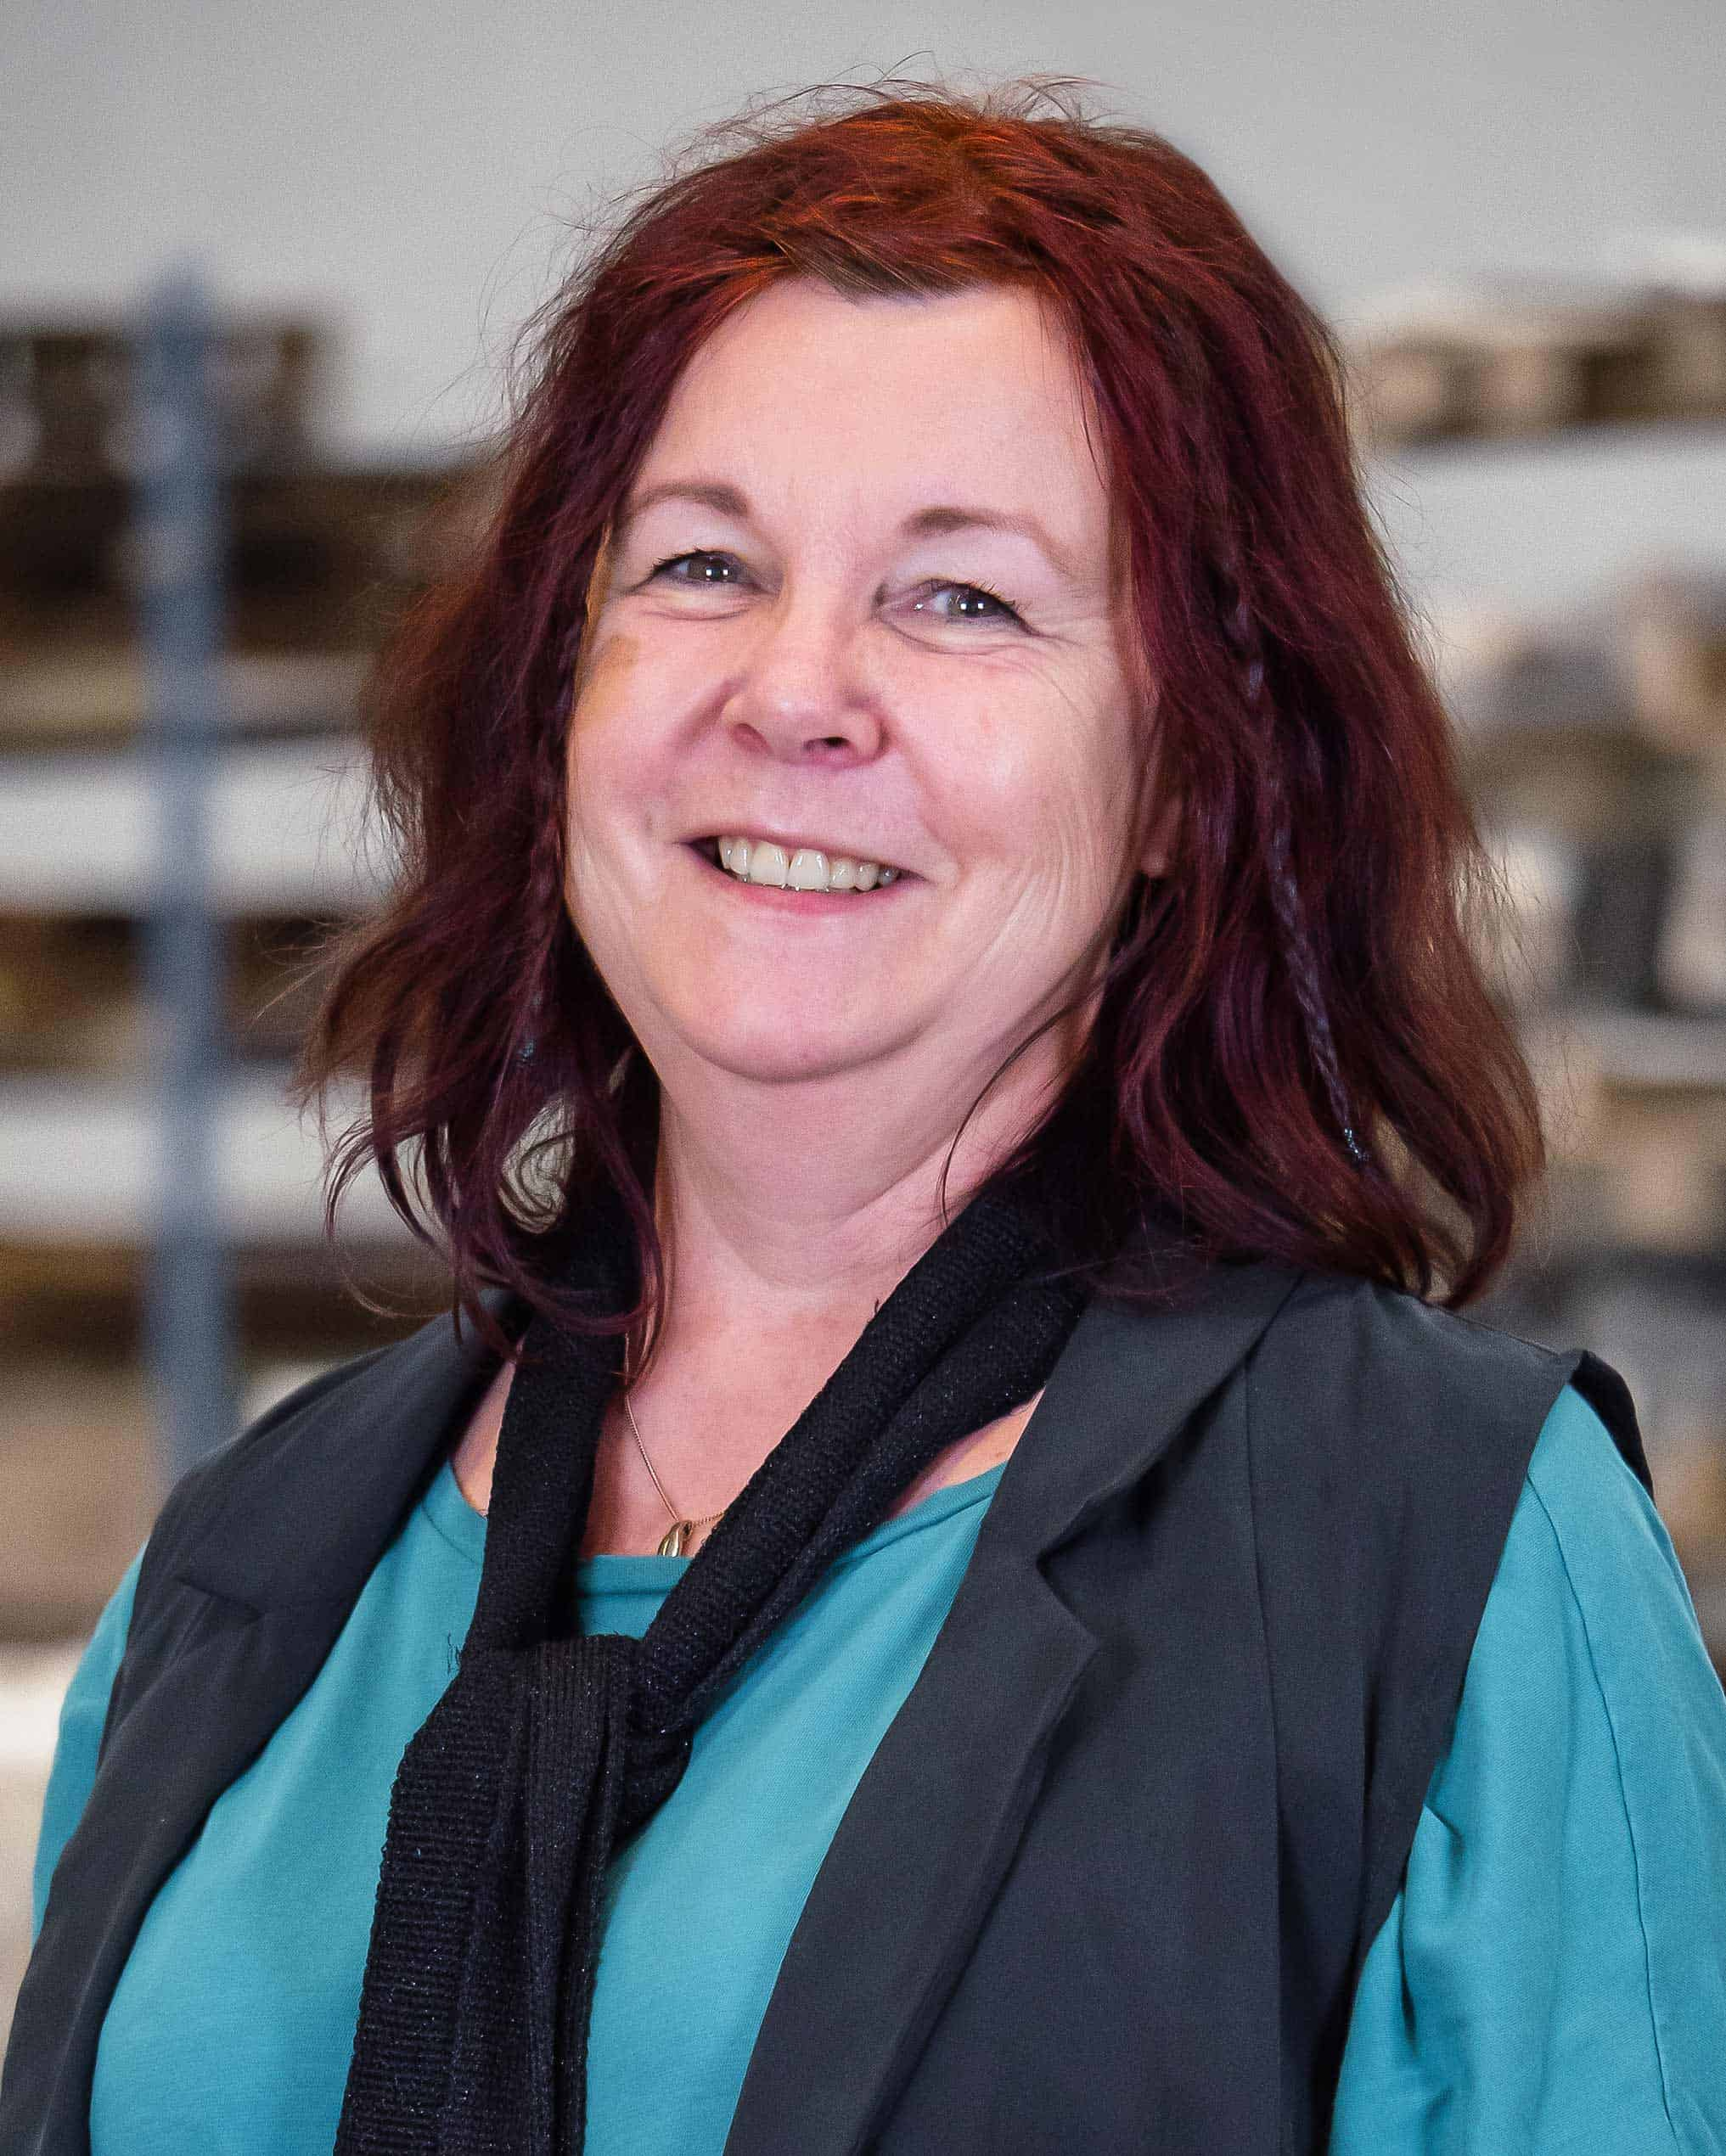 Yvonne Sandell